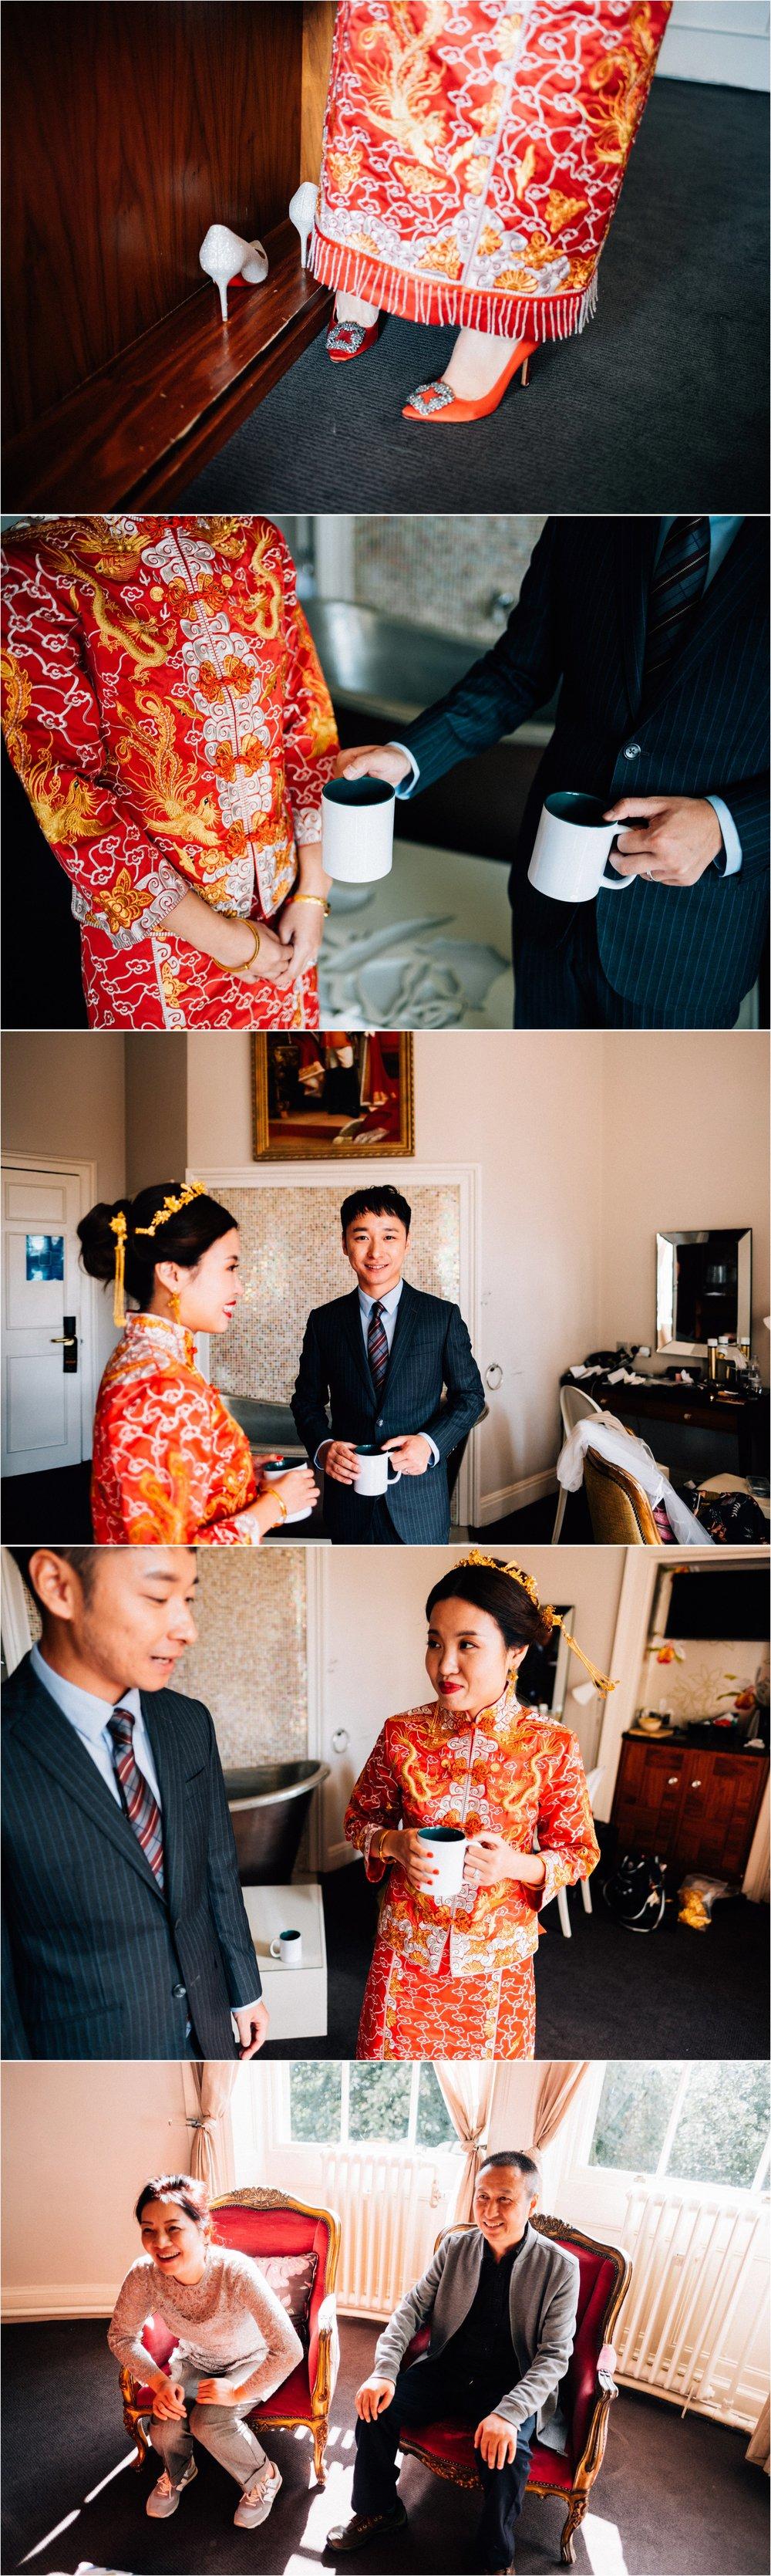 York city elopement wedding photographer_0162.jpg